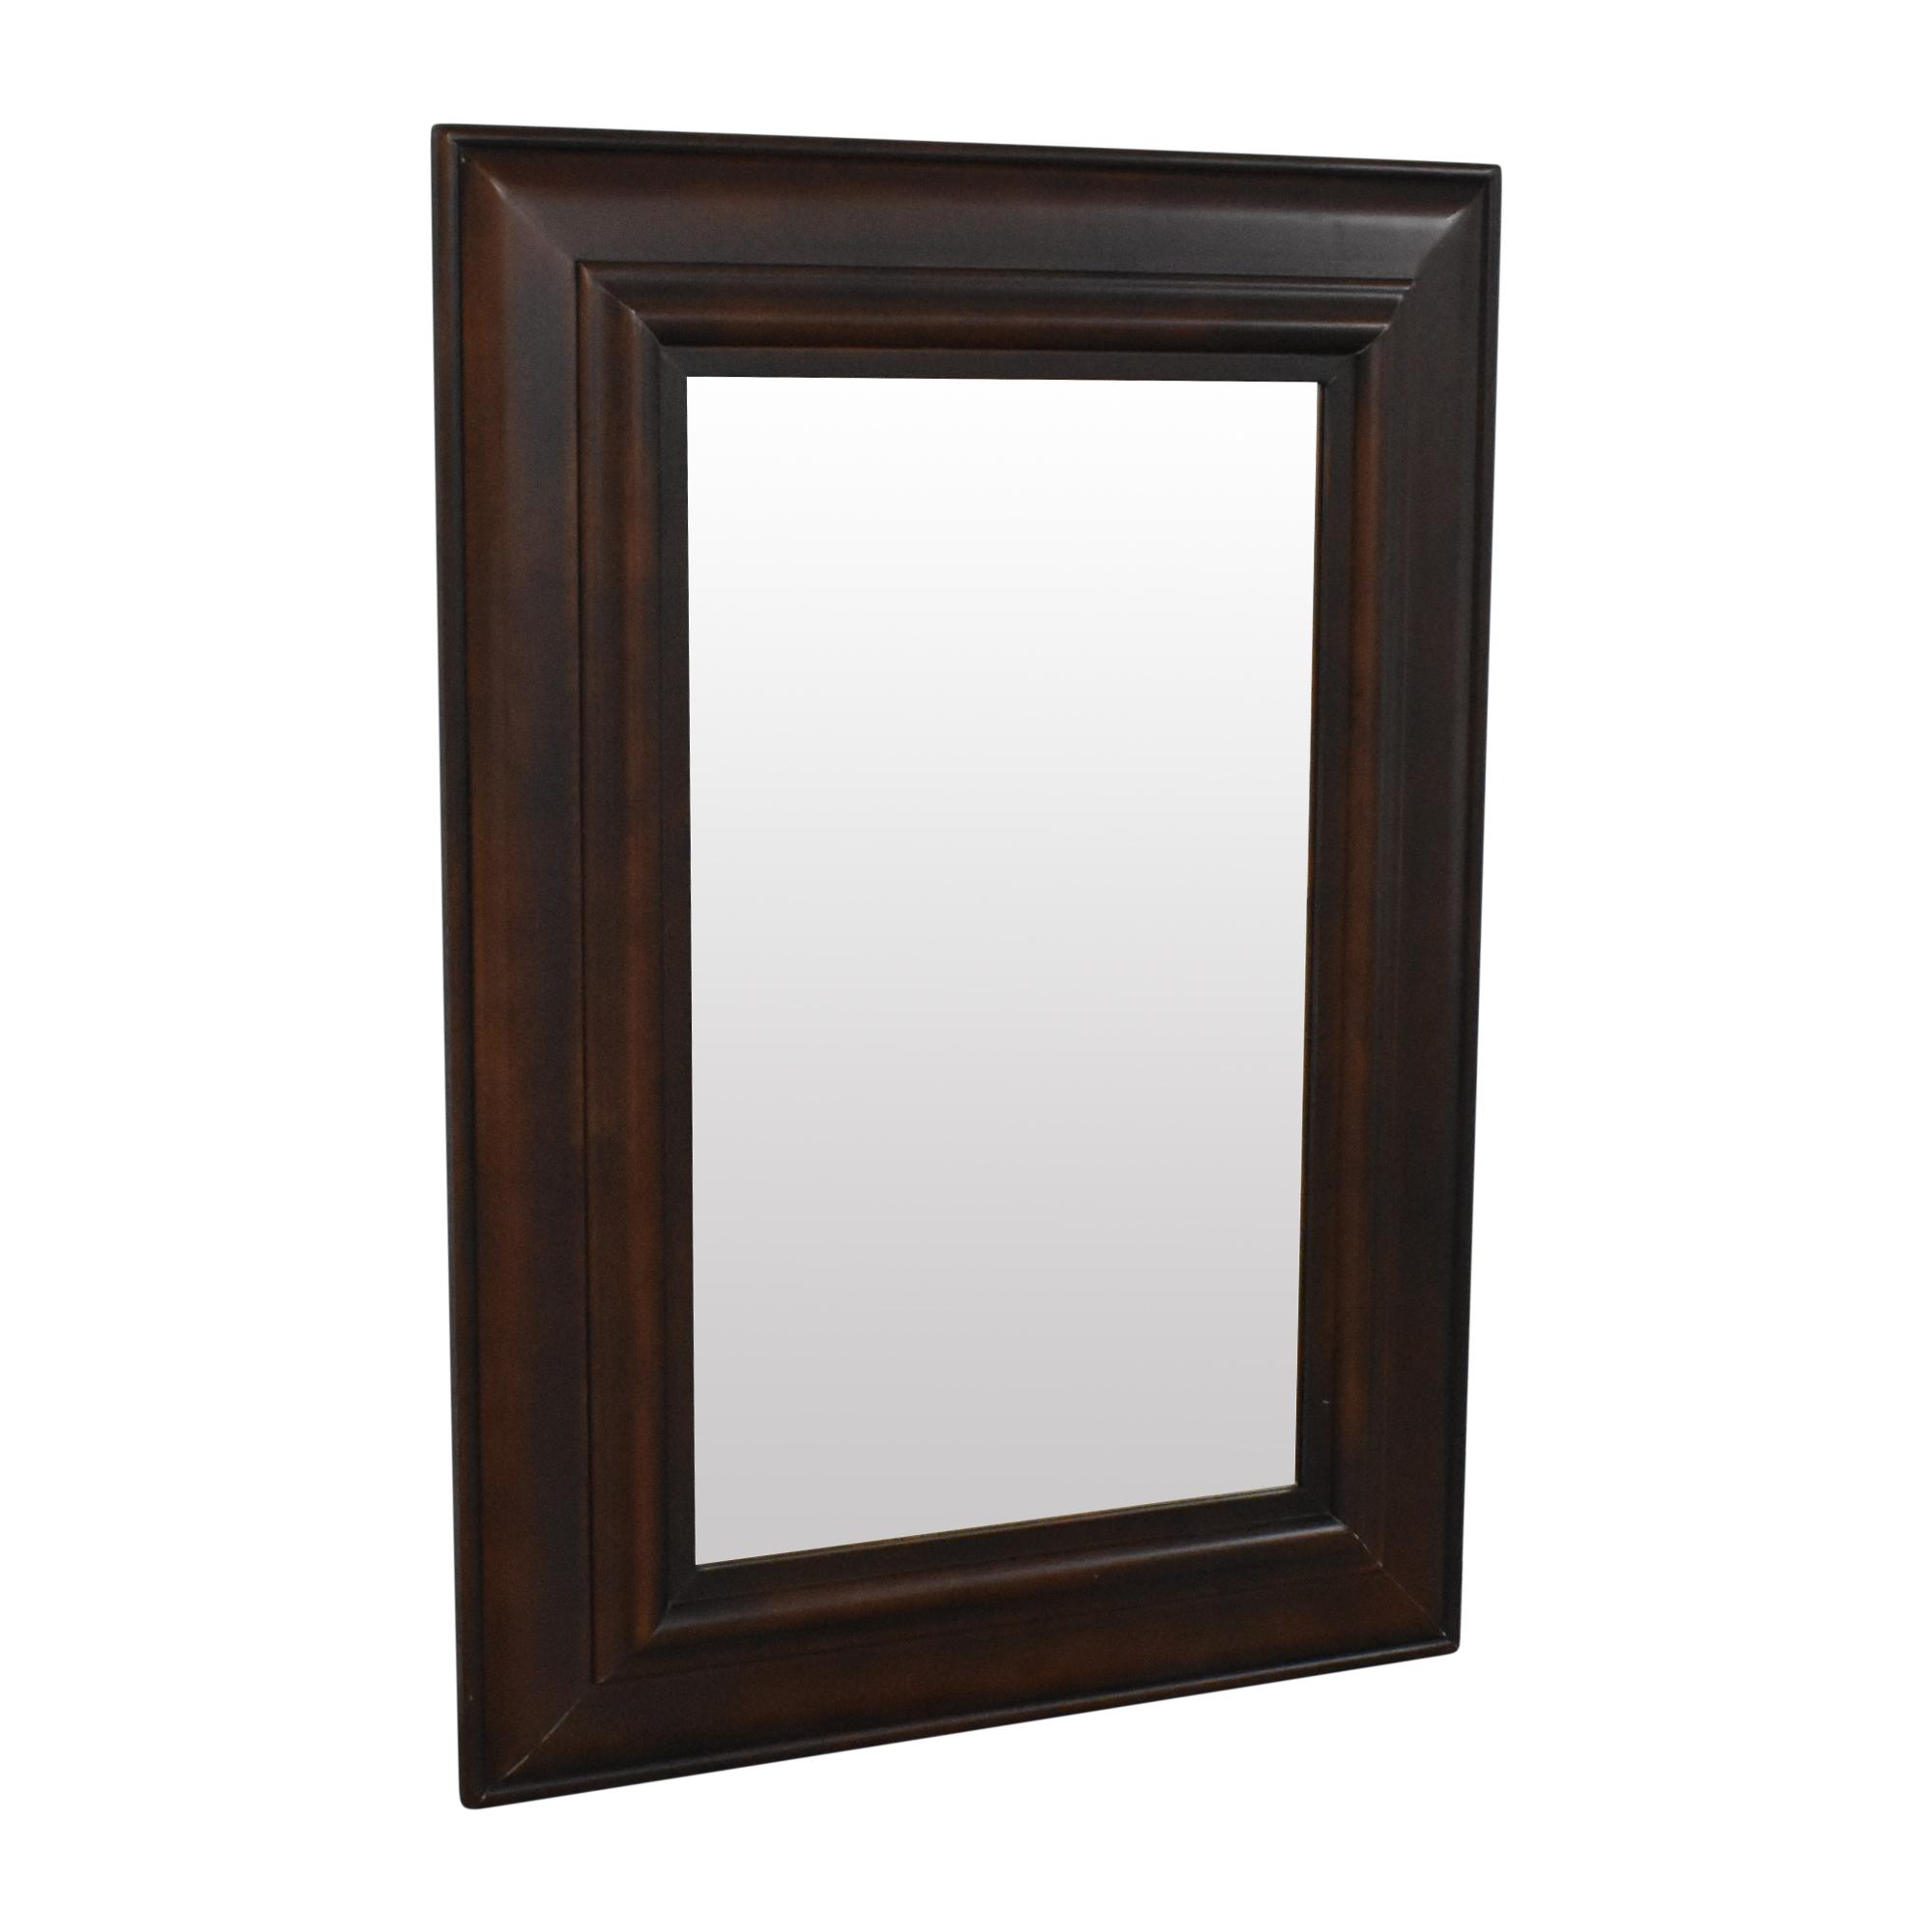 buy Pottery Barn Pottery Barn Framed Wall Mirror online